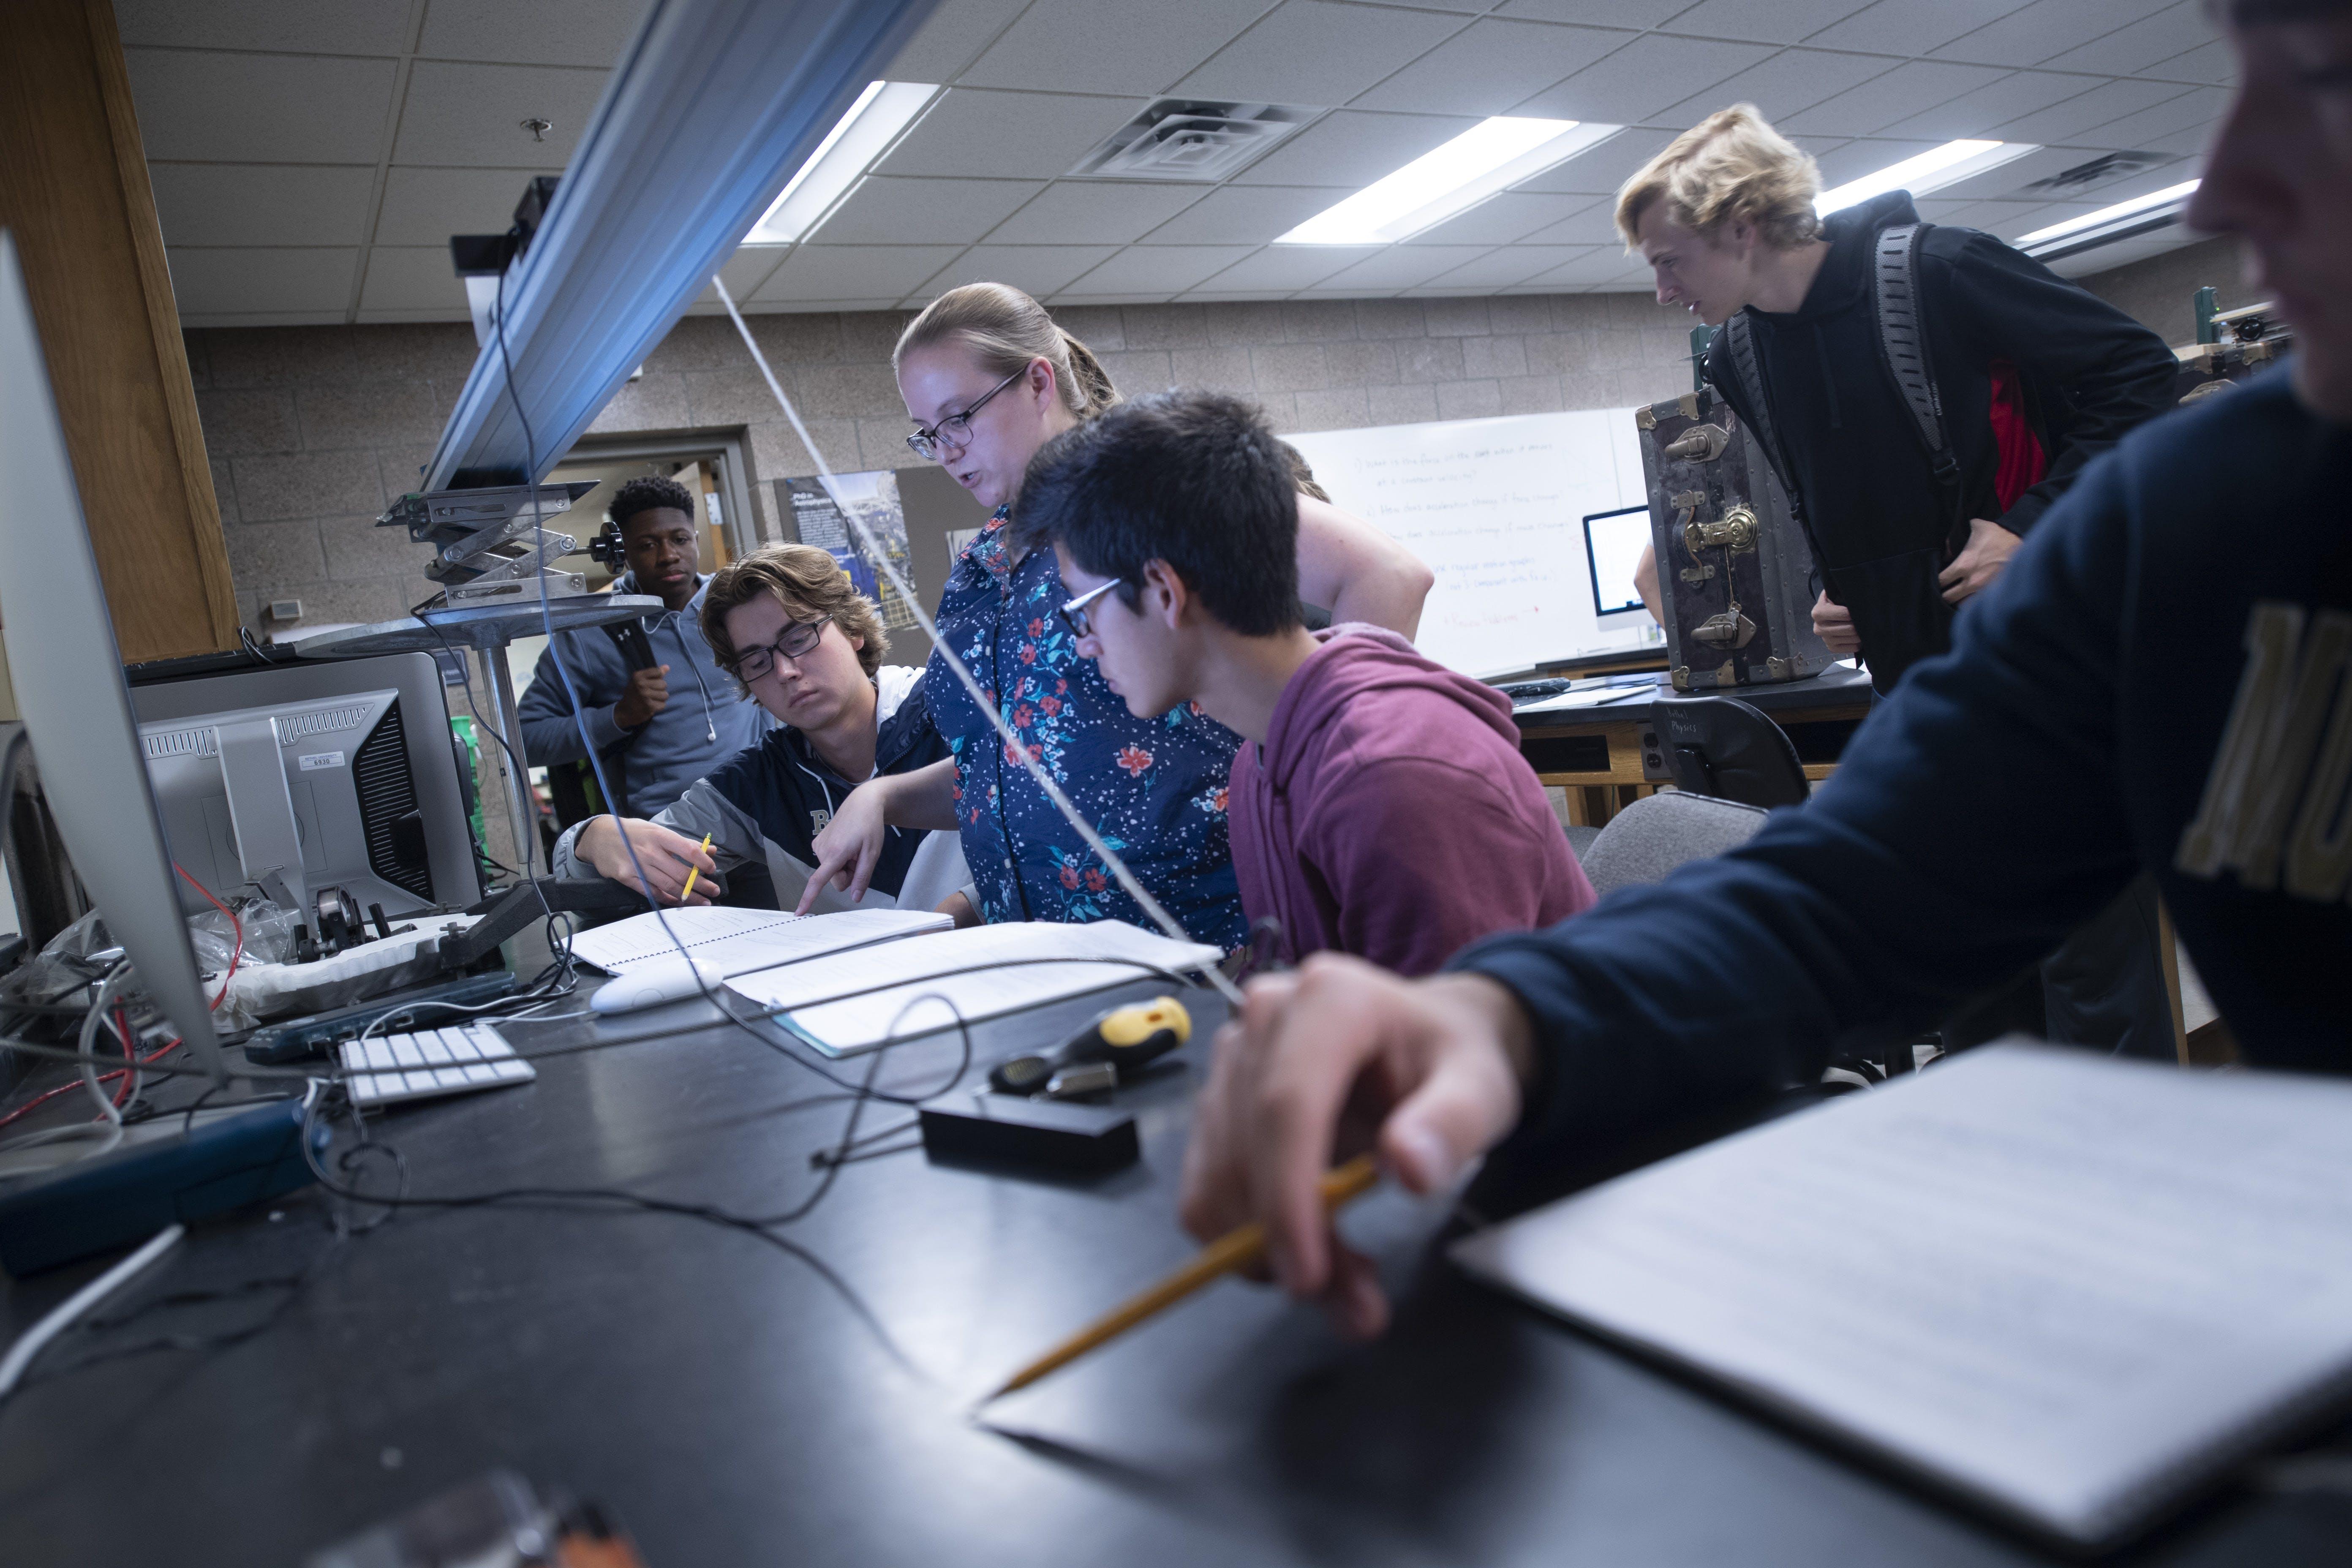 Mechanical engineering students at Bethel University